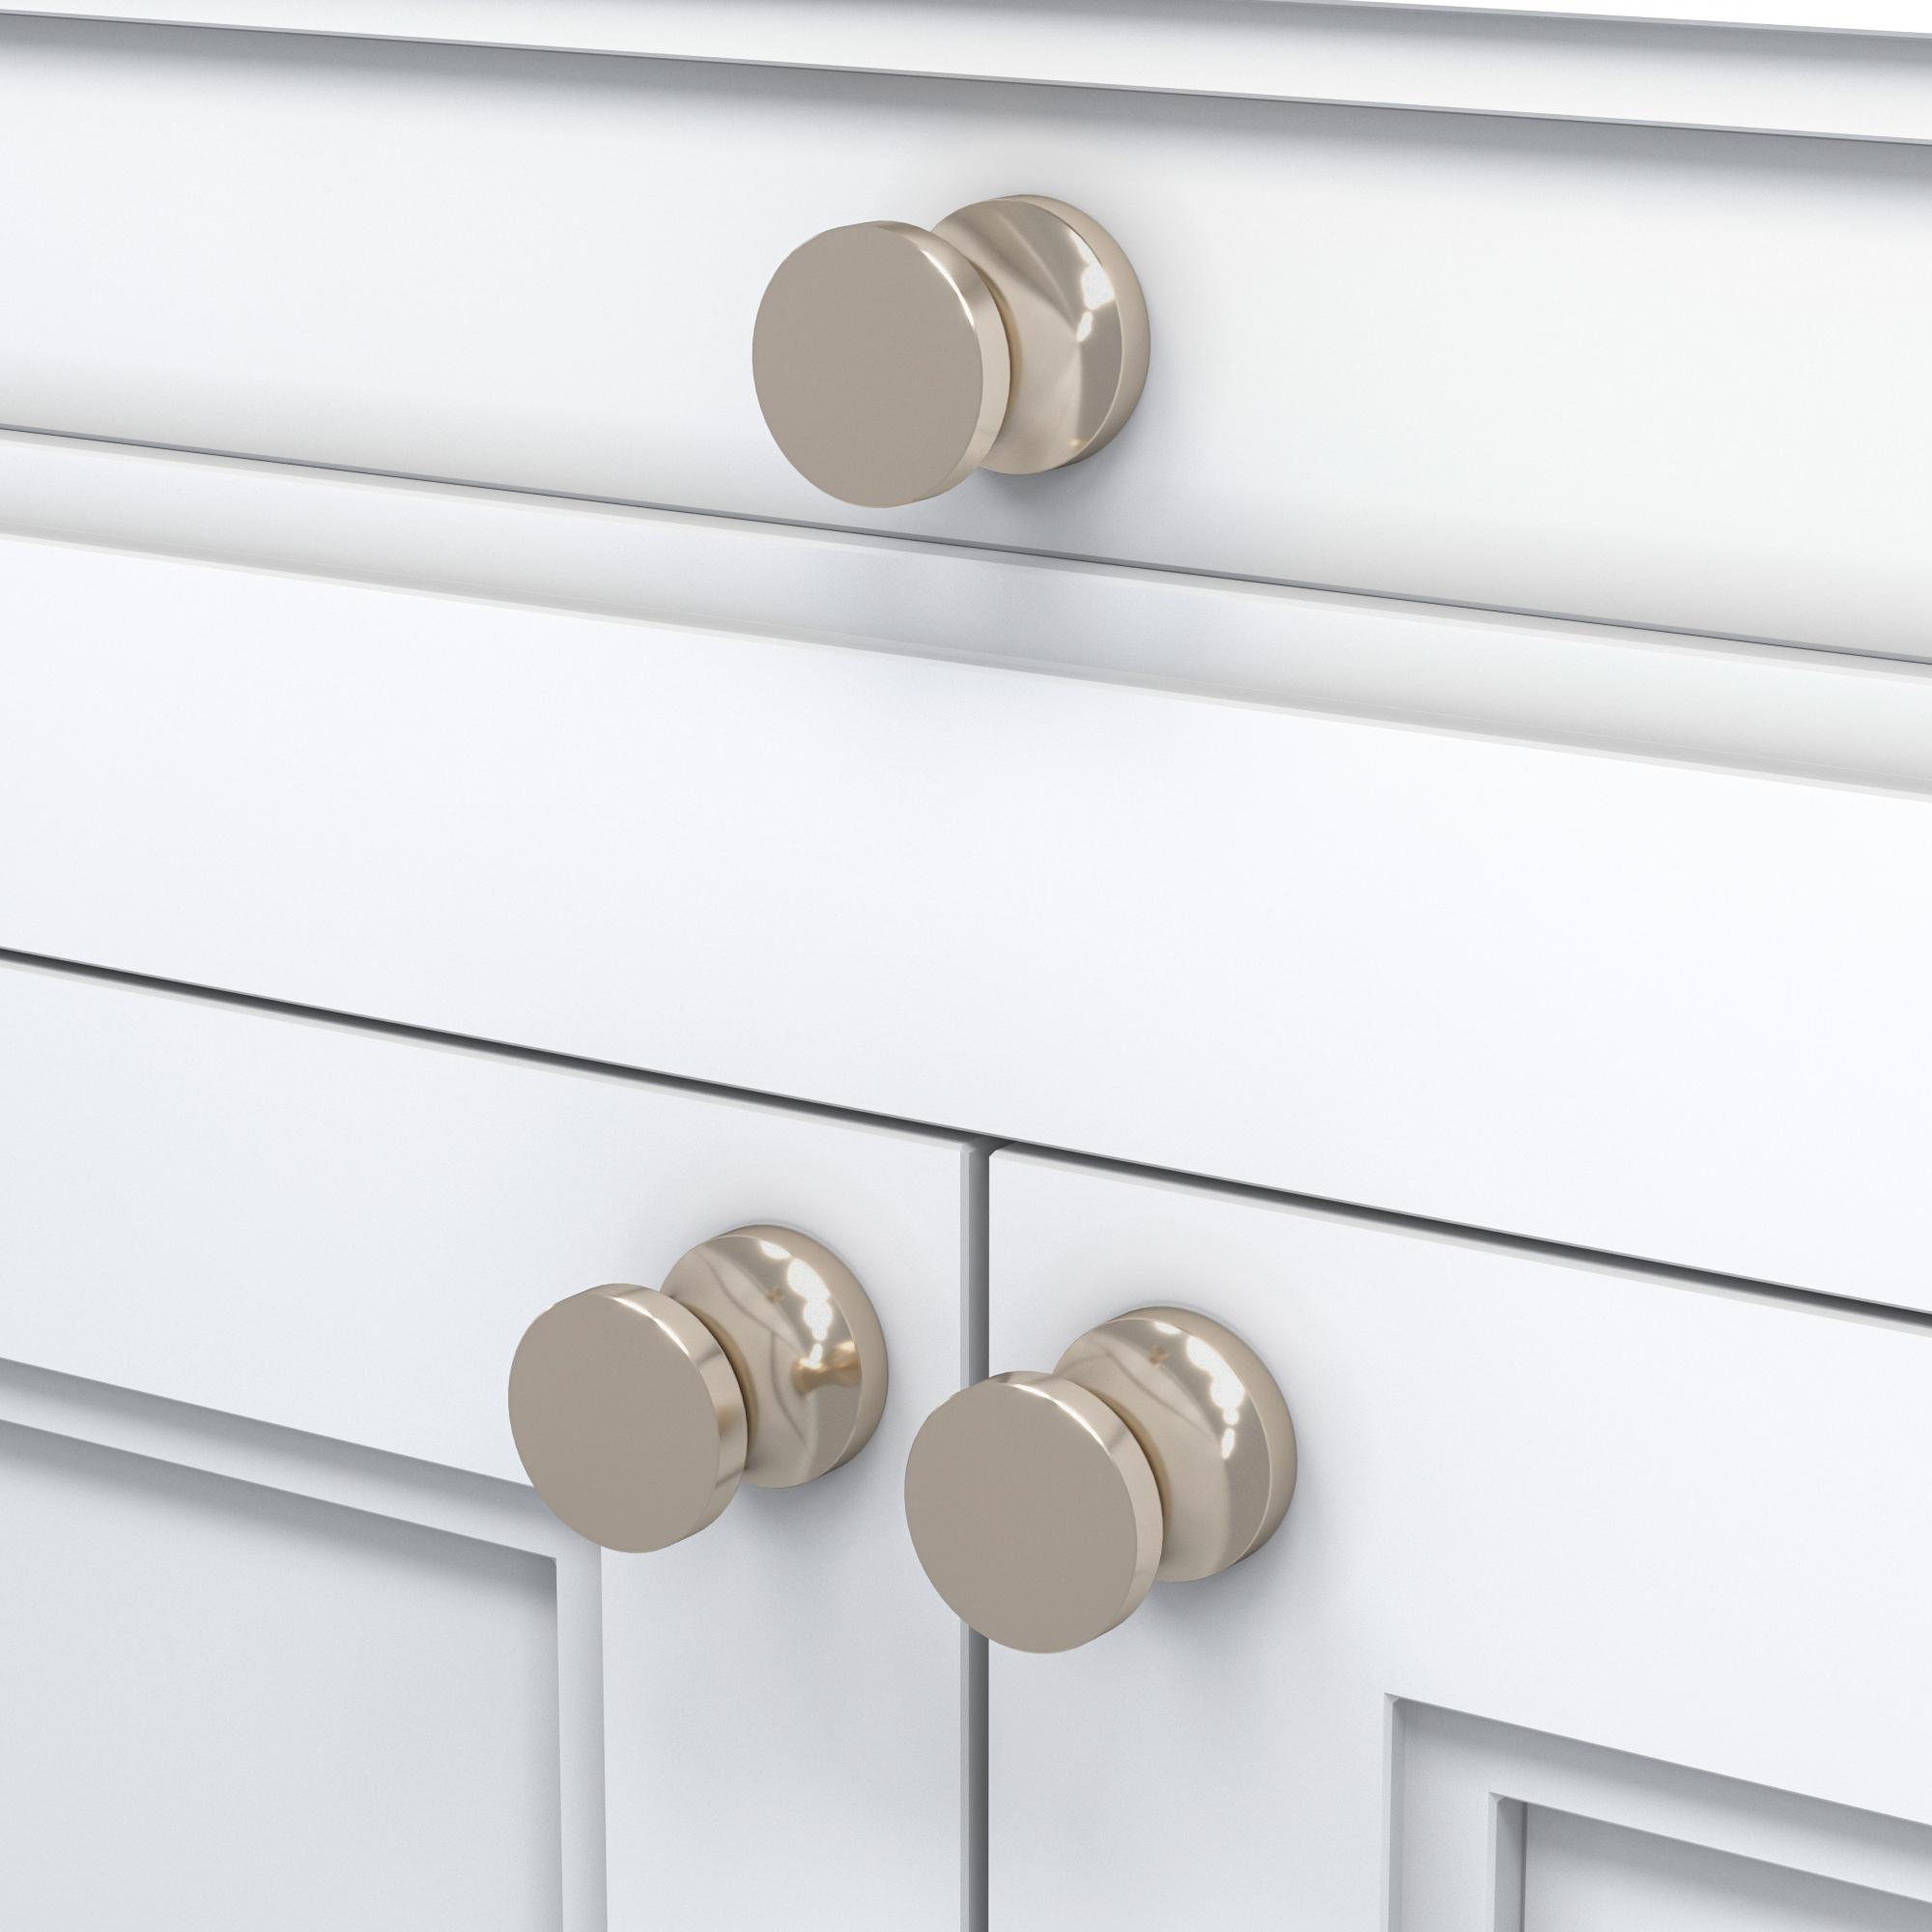 Кнопка Poplar/Polished Nickel